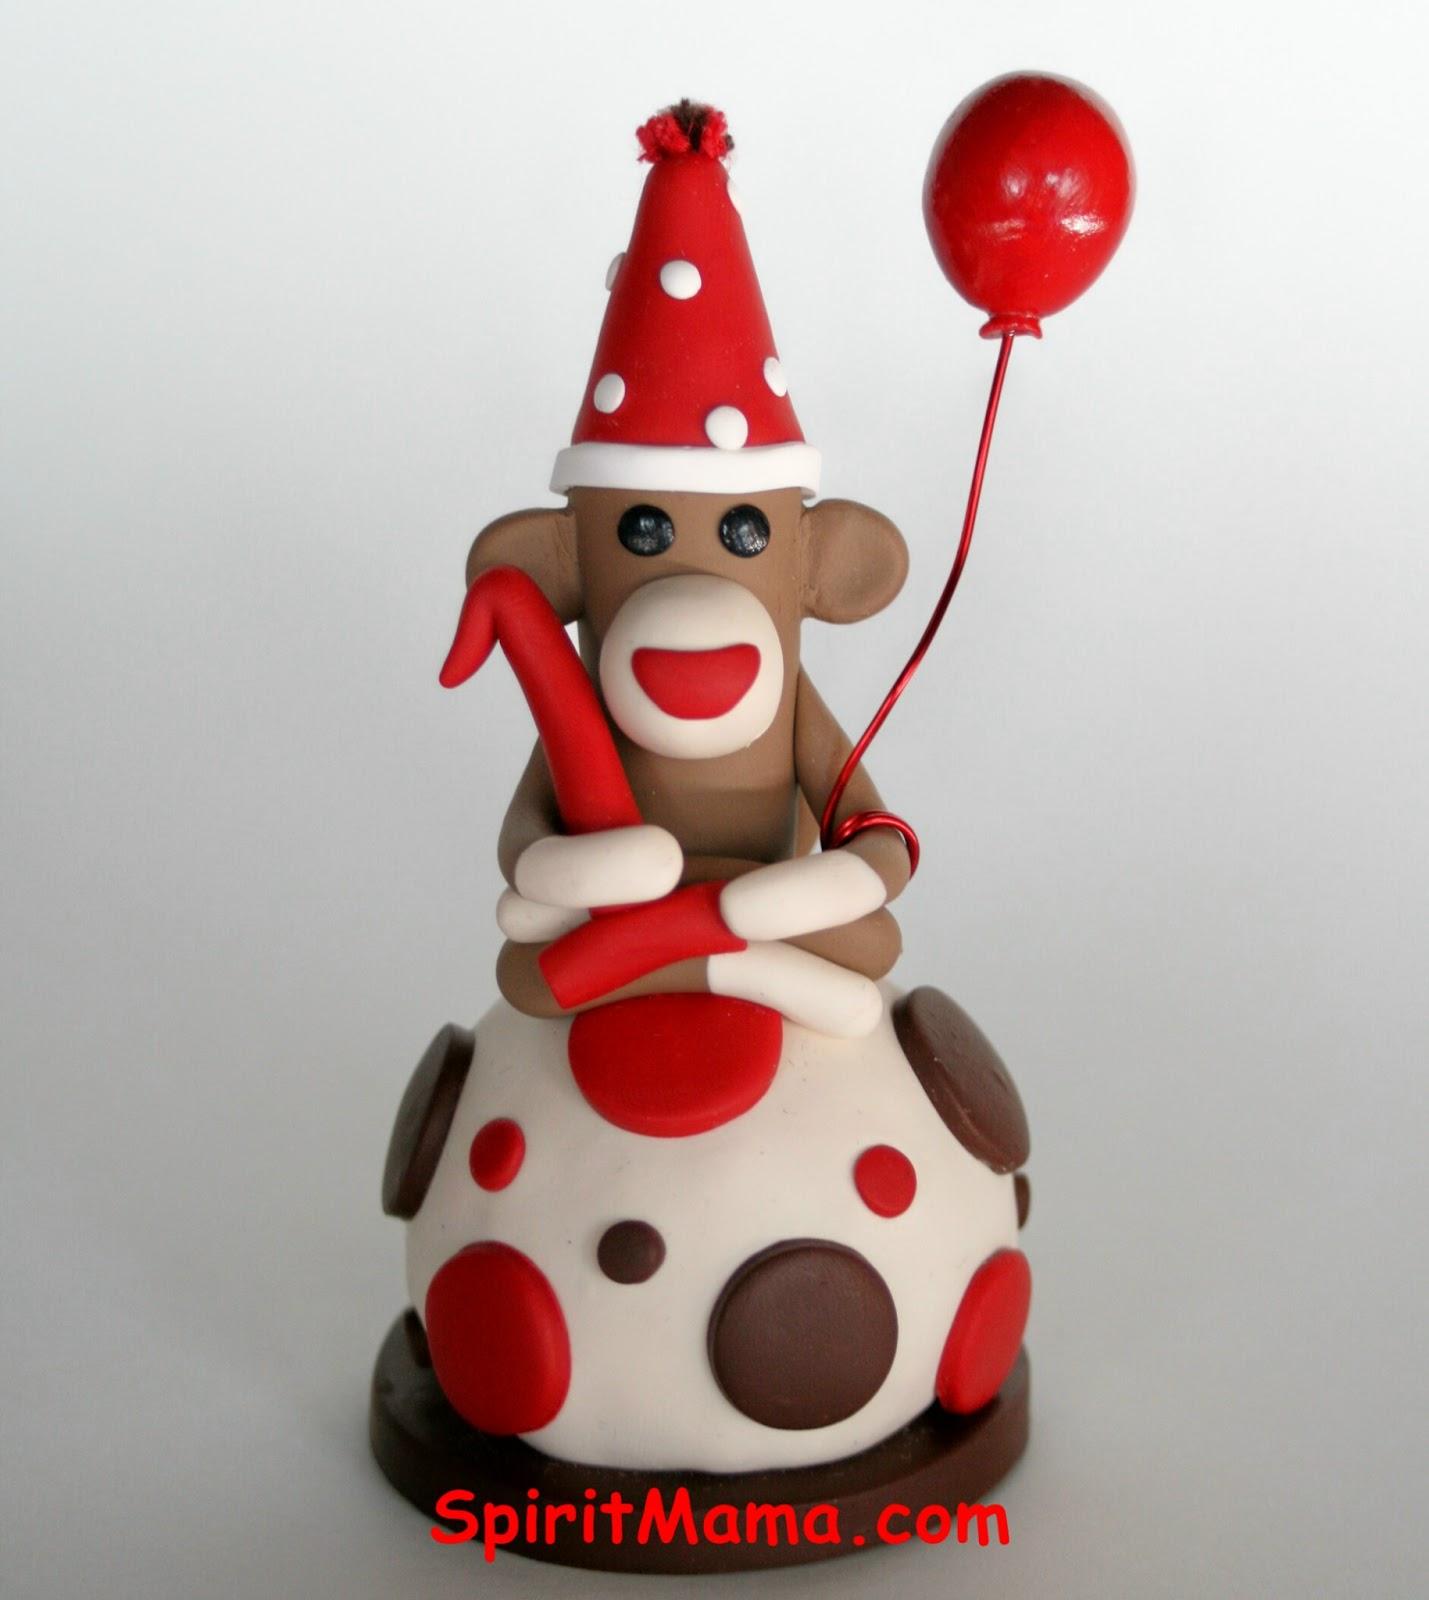 SpiritMama Art and Soul: Sock Monkey SMASH CAKE Toppers